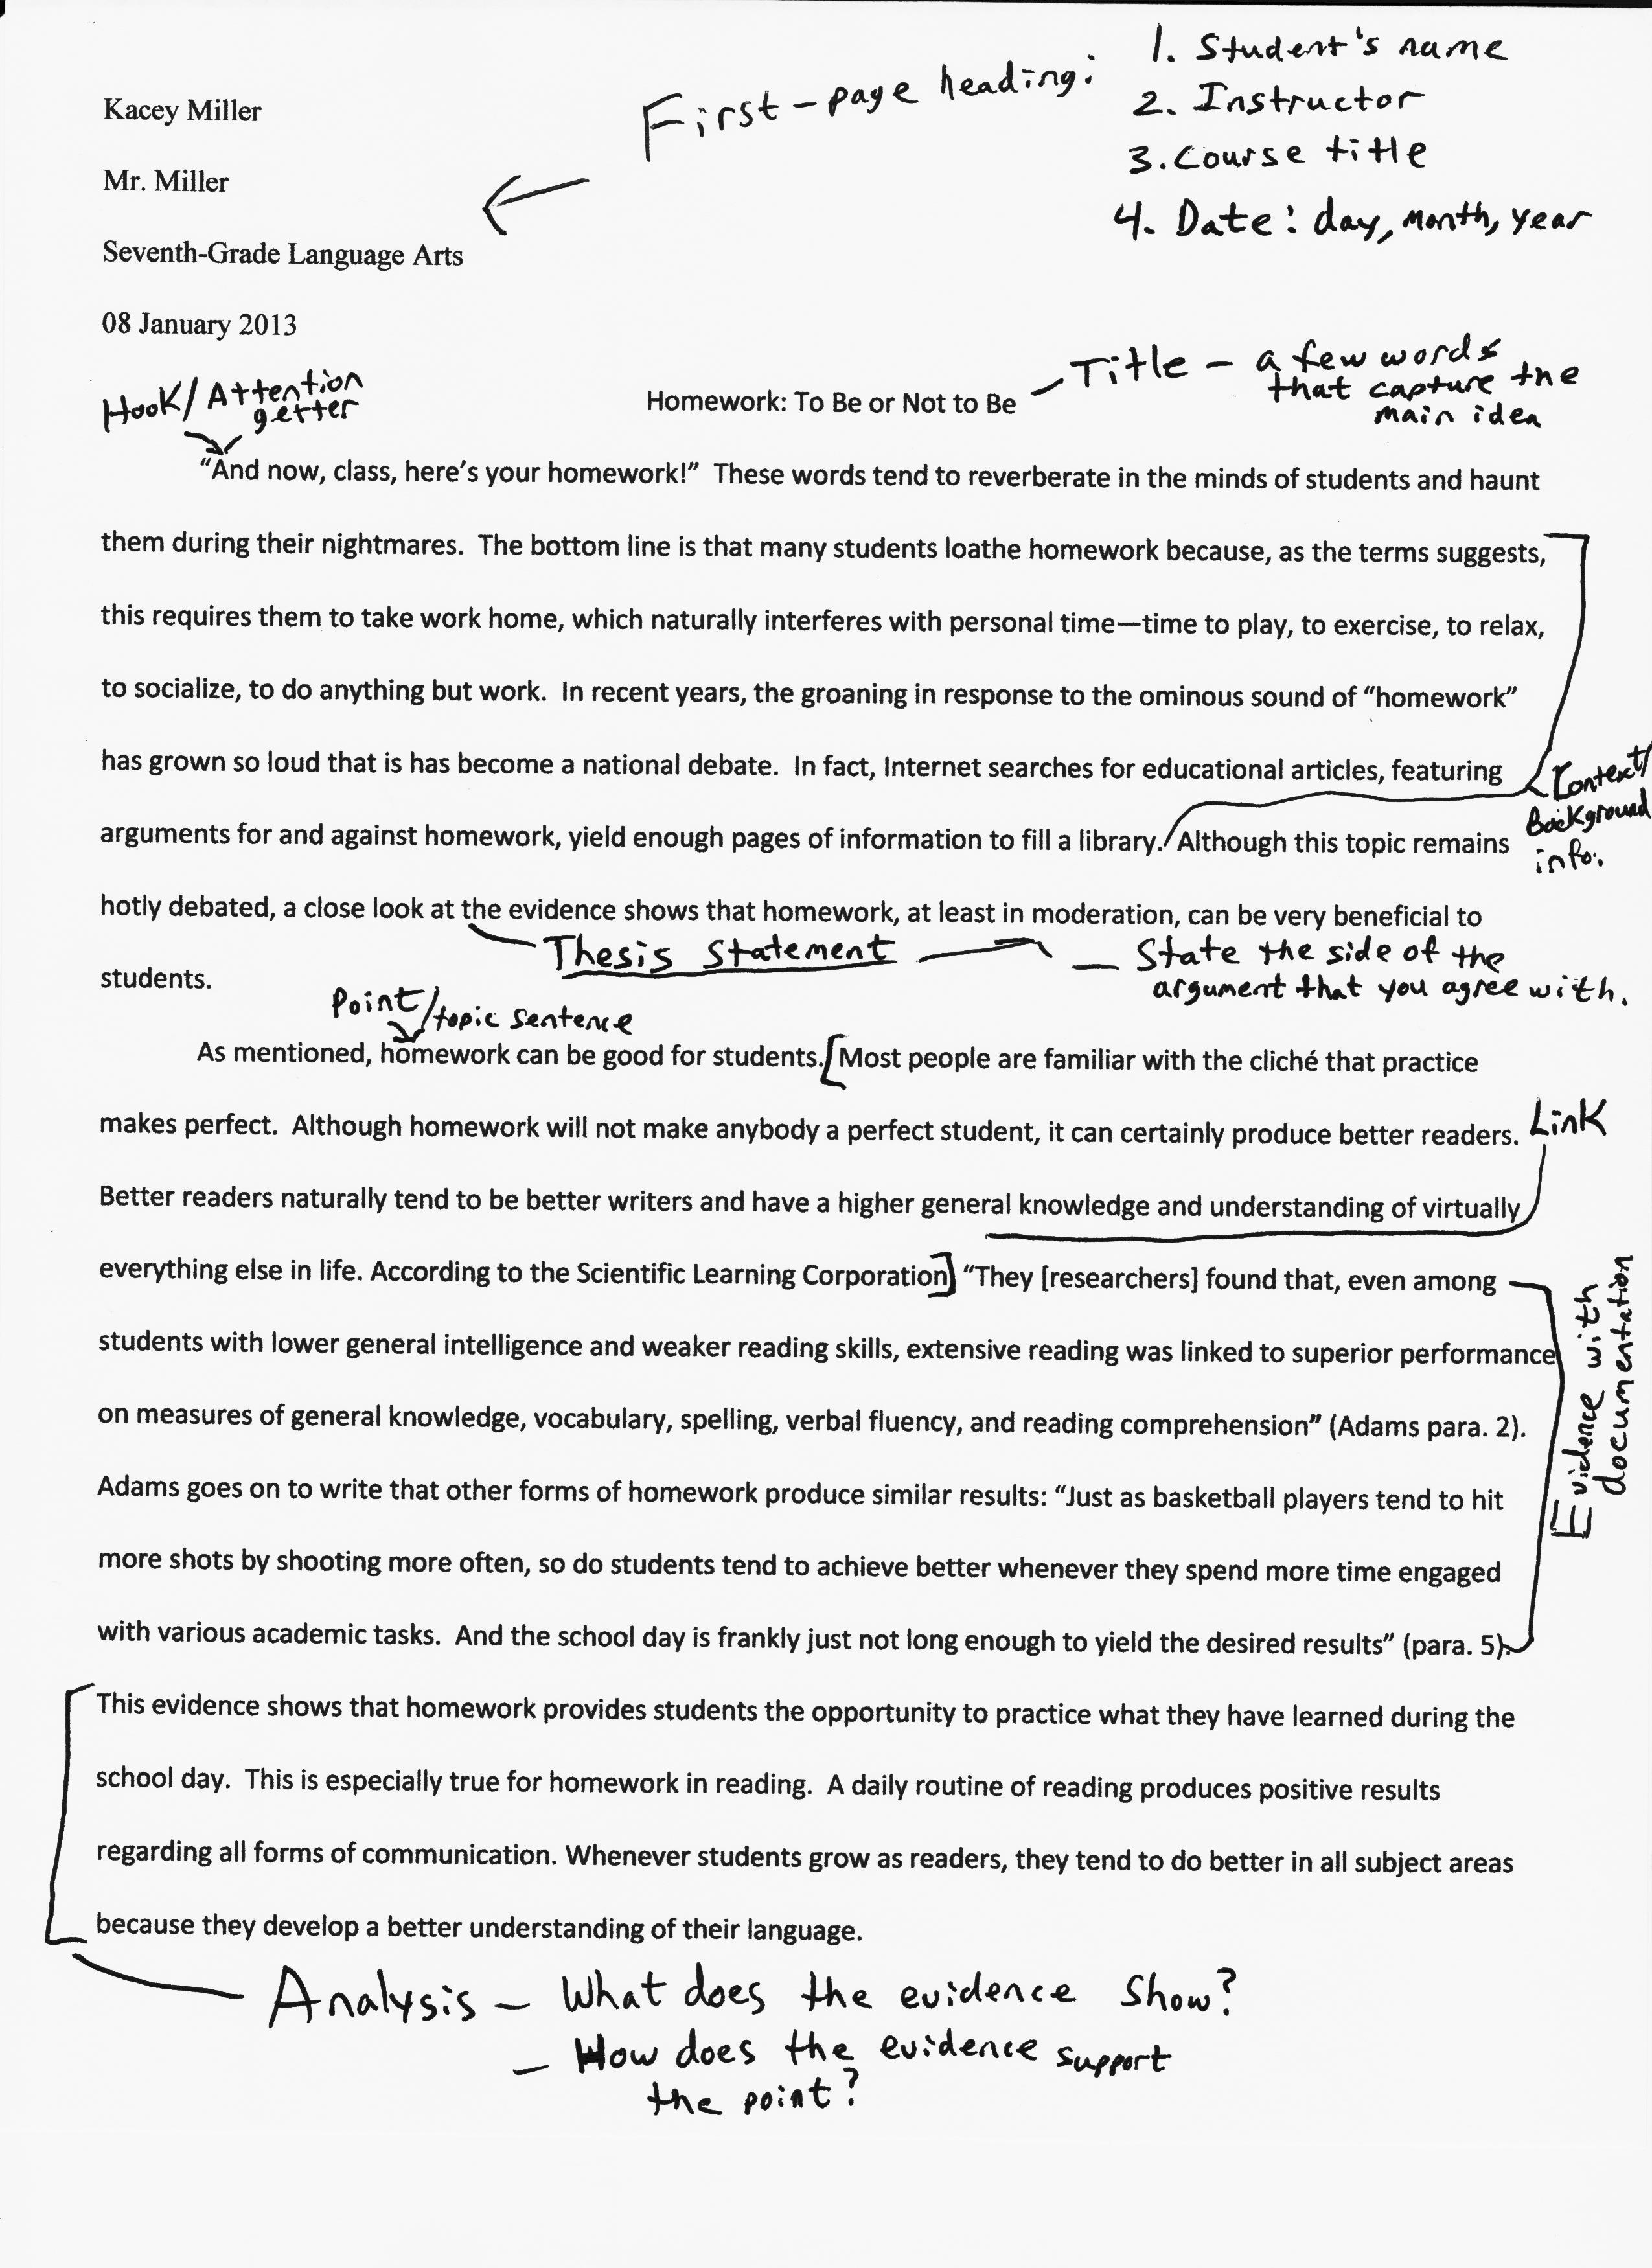 007 Rogerian Argument Essay Example Staggering Topics Full